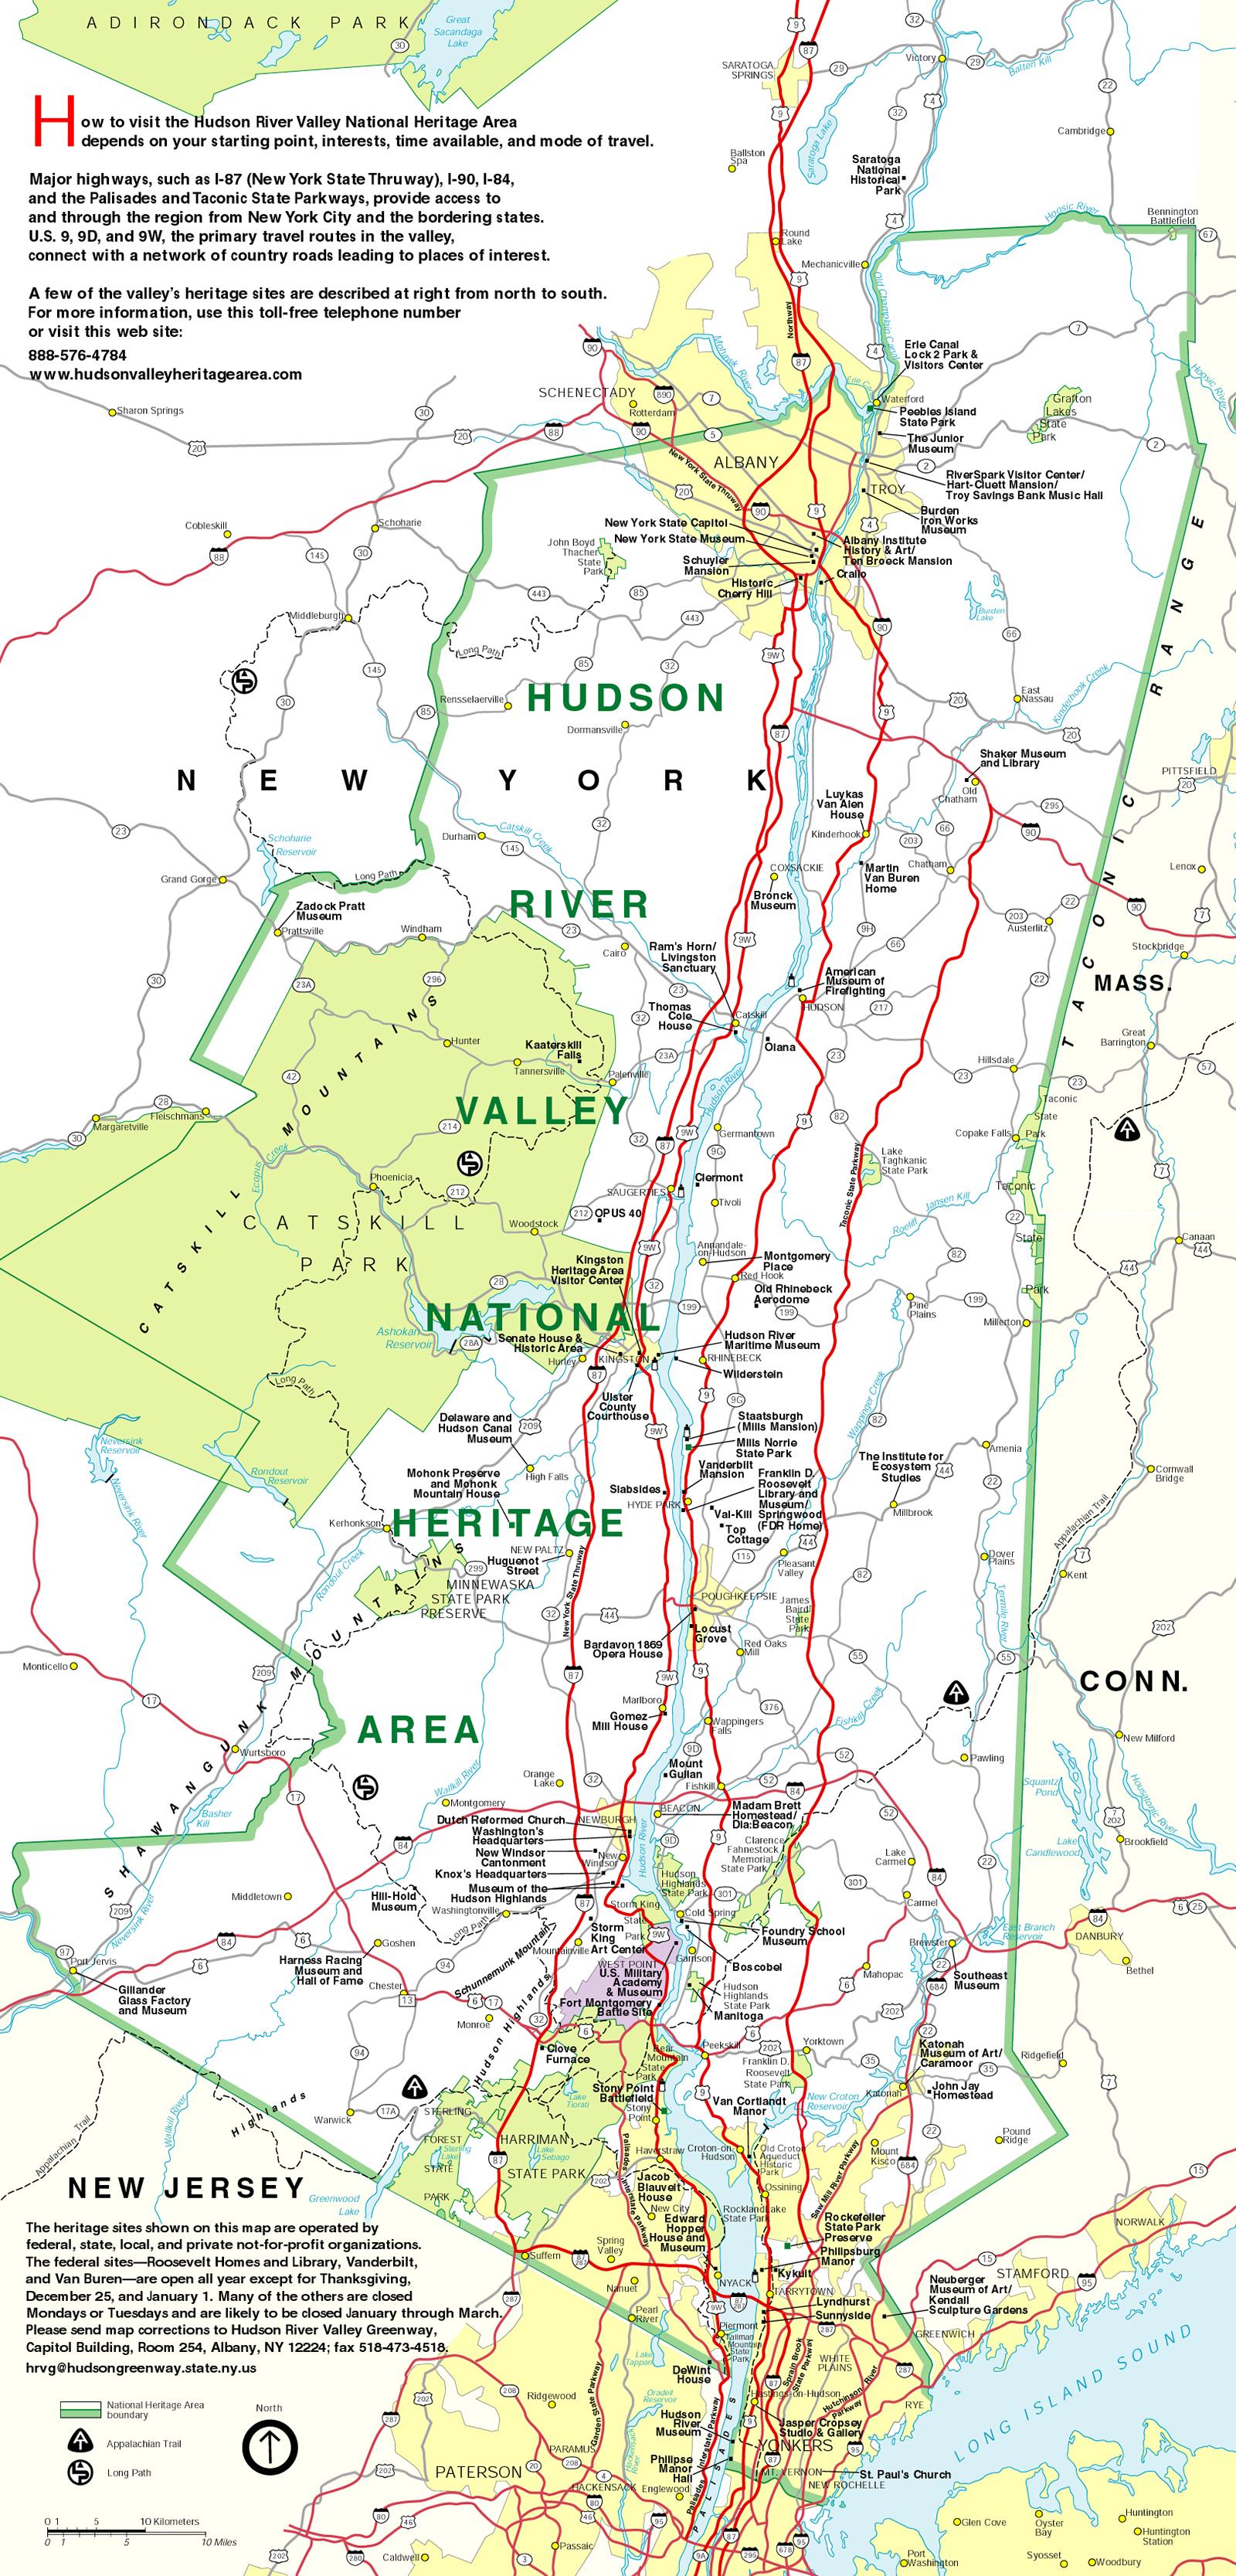 Hudson River Valley Map - HRVI on